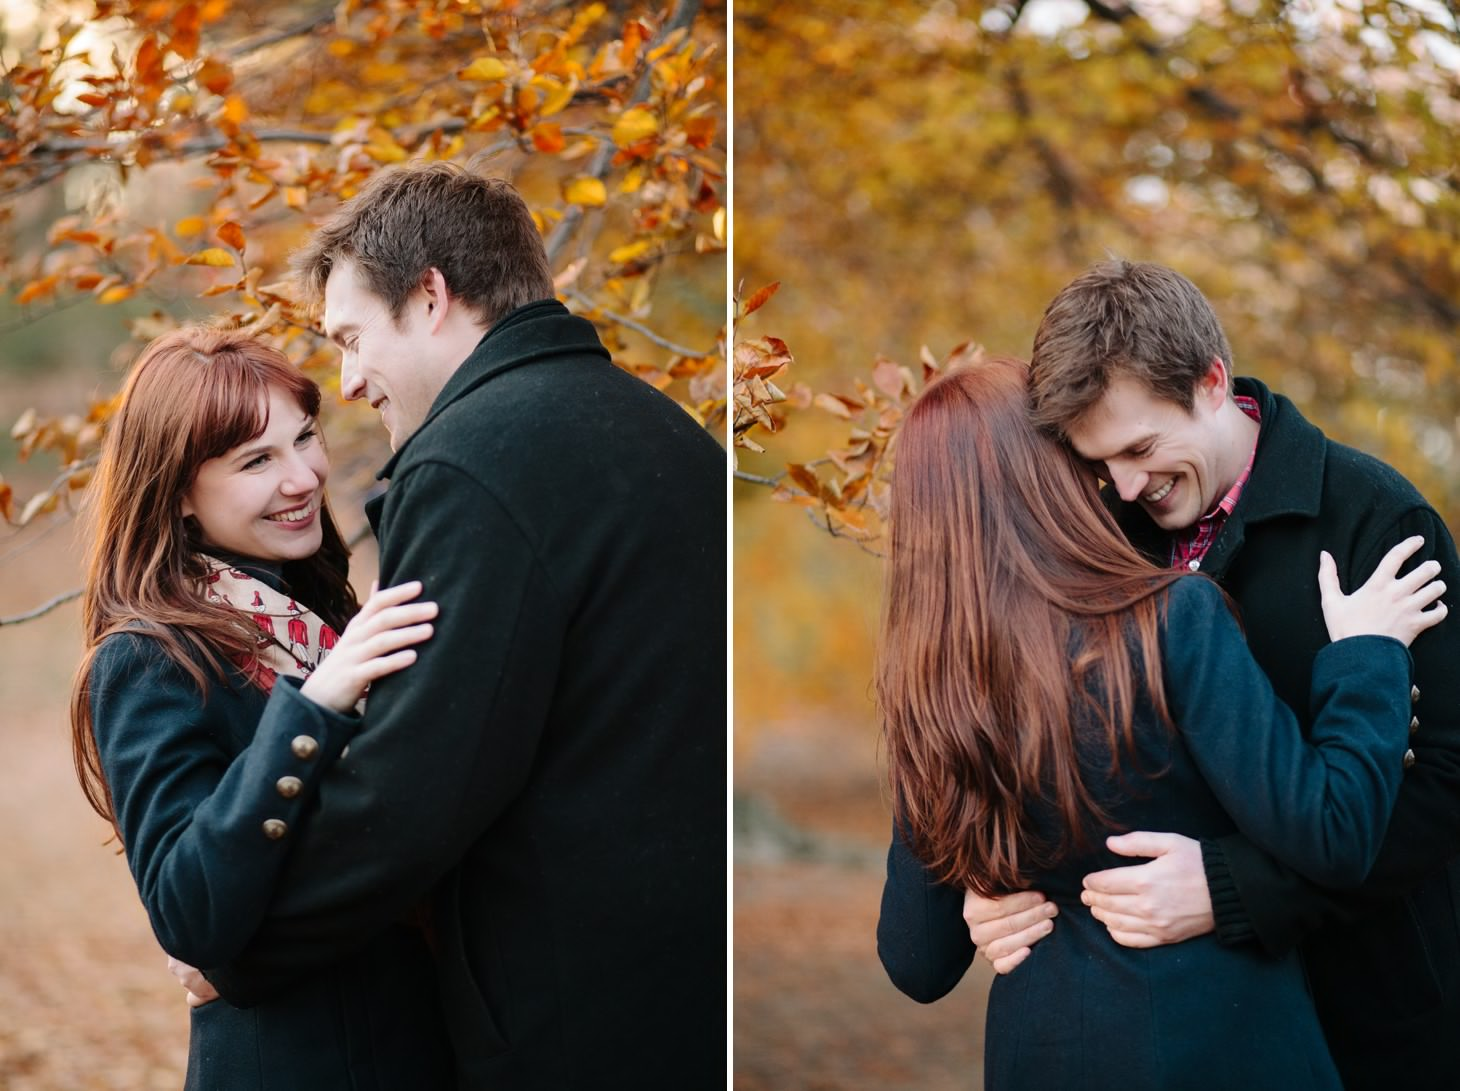 006-nyc-wedding-photographer-smitten-chickens-elope-nyc-wedding-photographer-museum-wedding-smitten-chickens-metropolitan-museum-nyc-engagement-photos-x.jpg